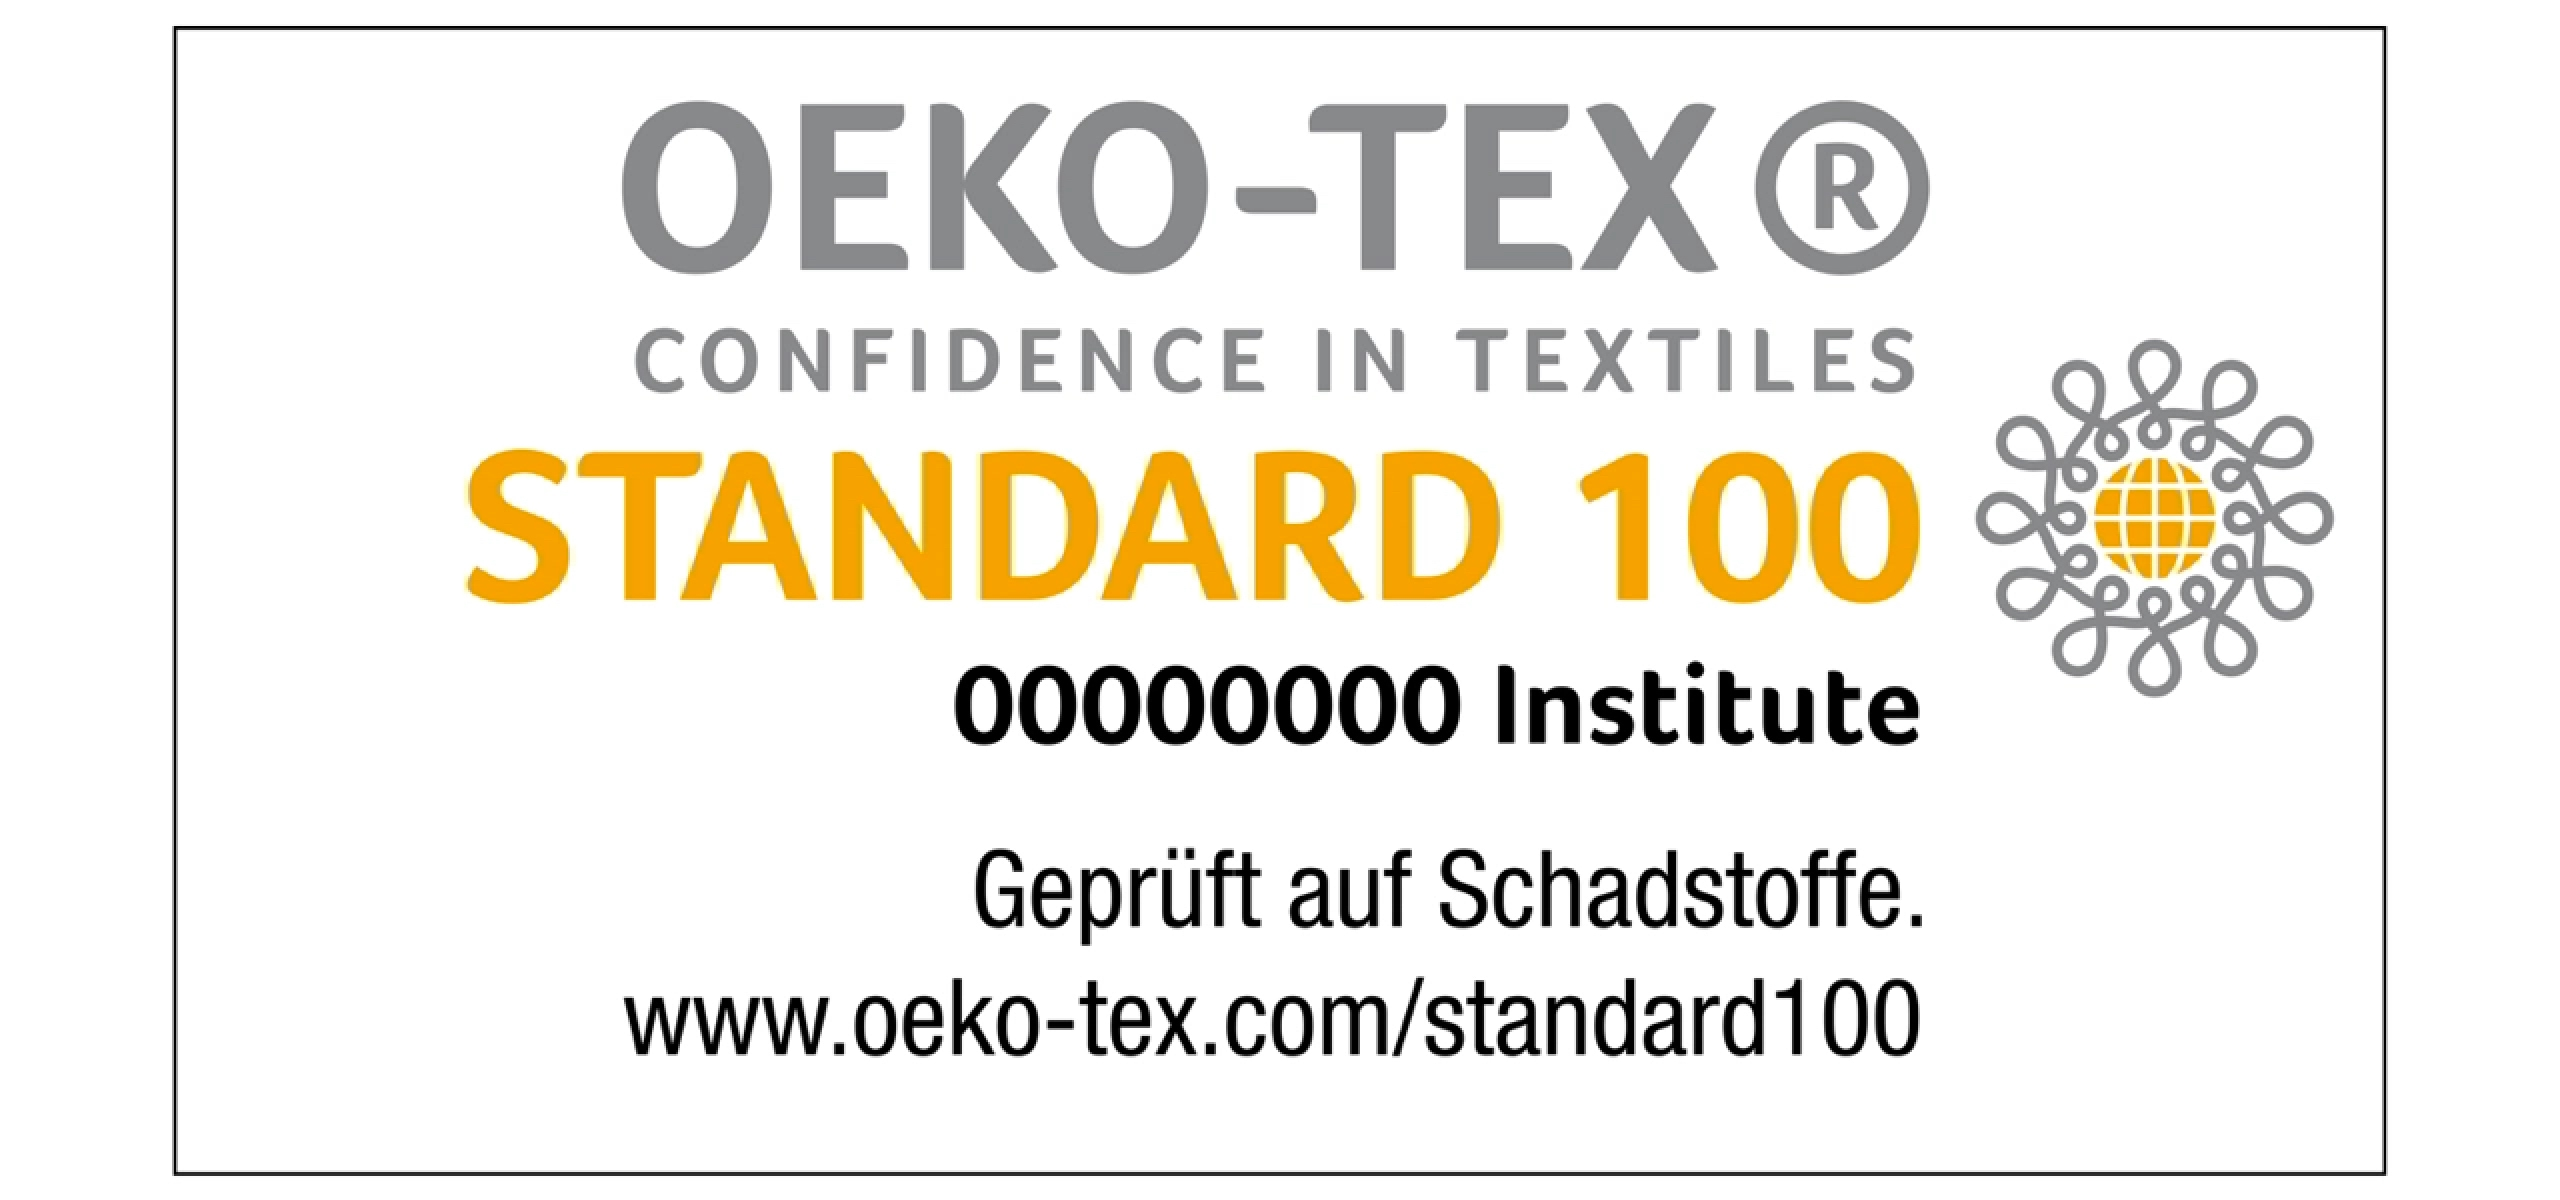 OekoTex Standard 100